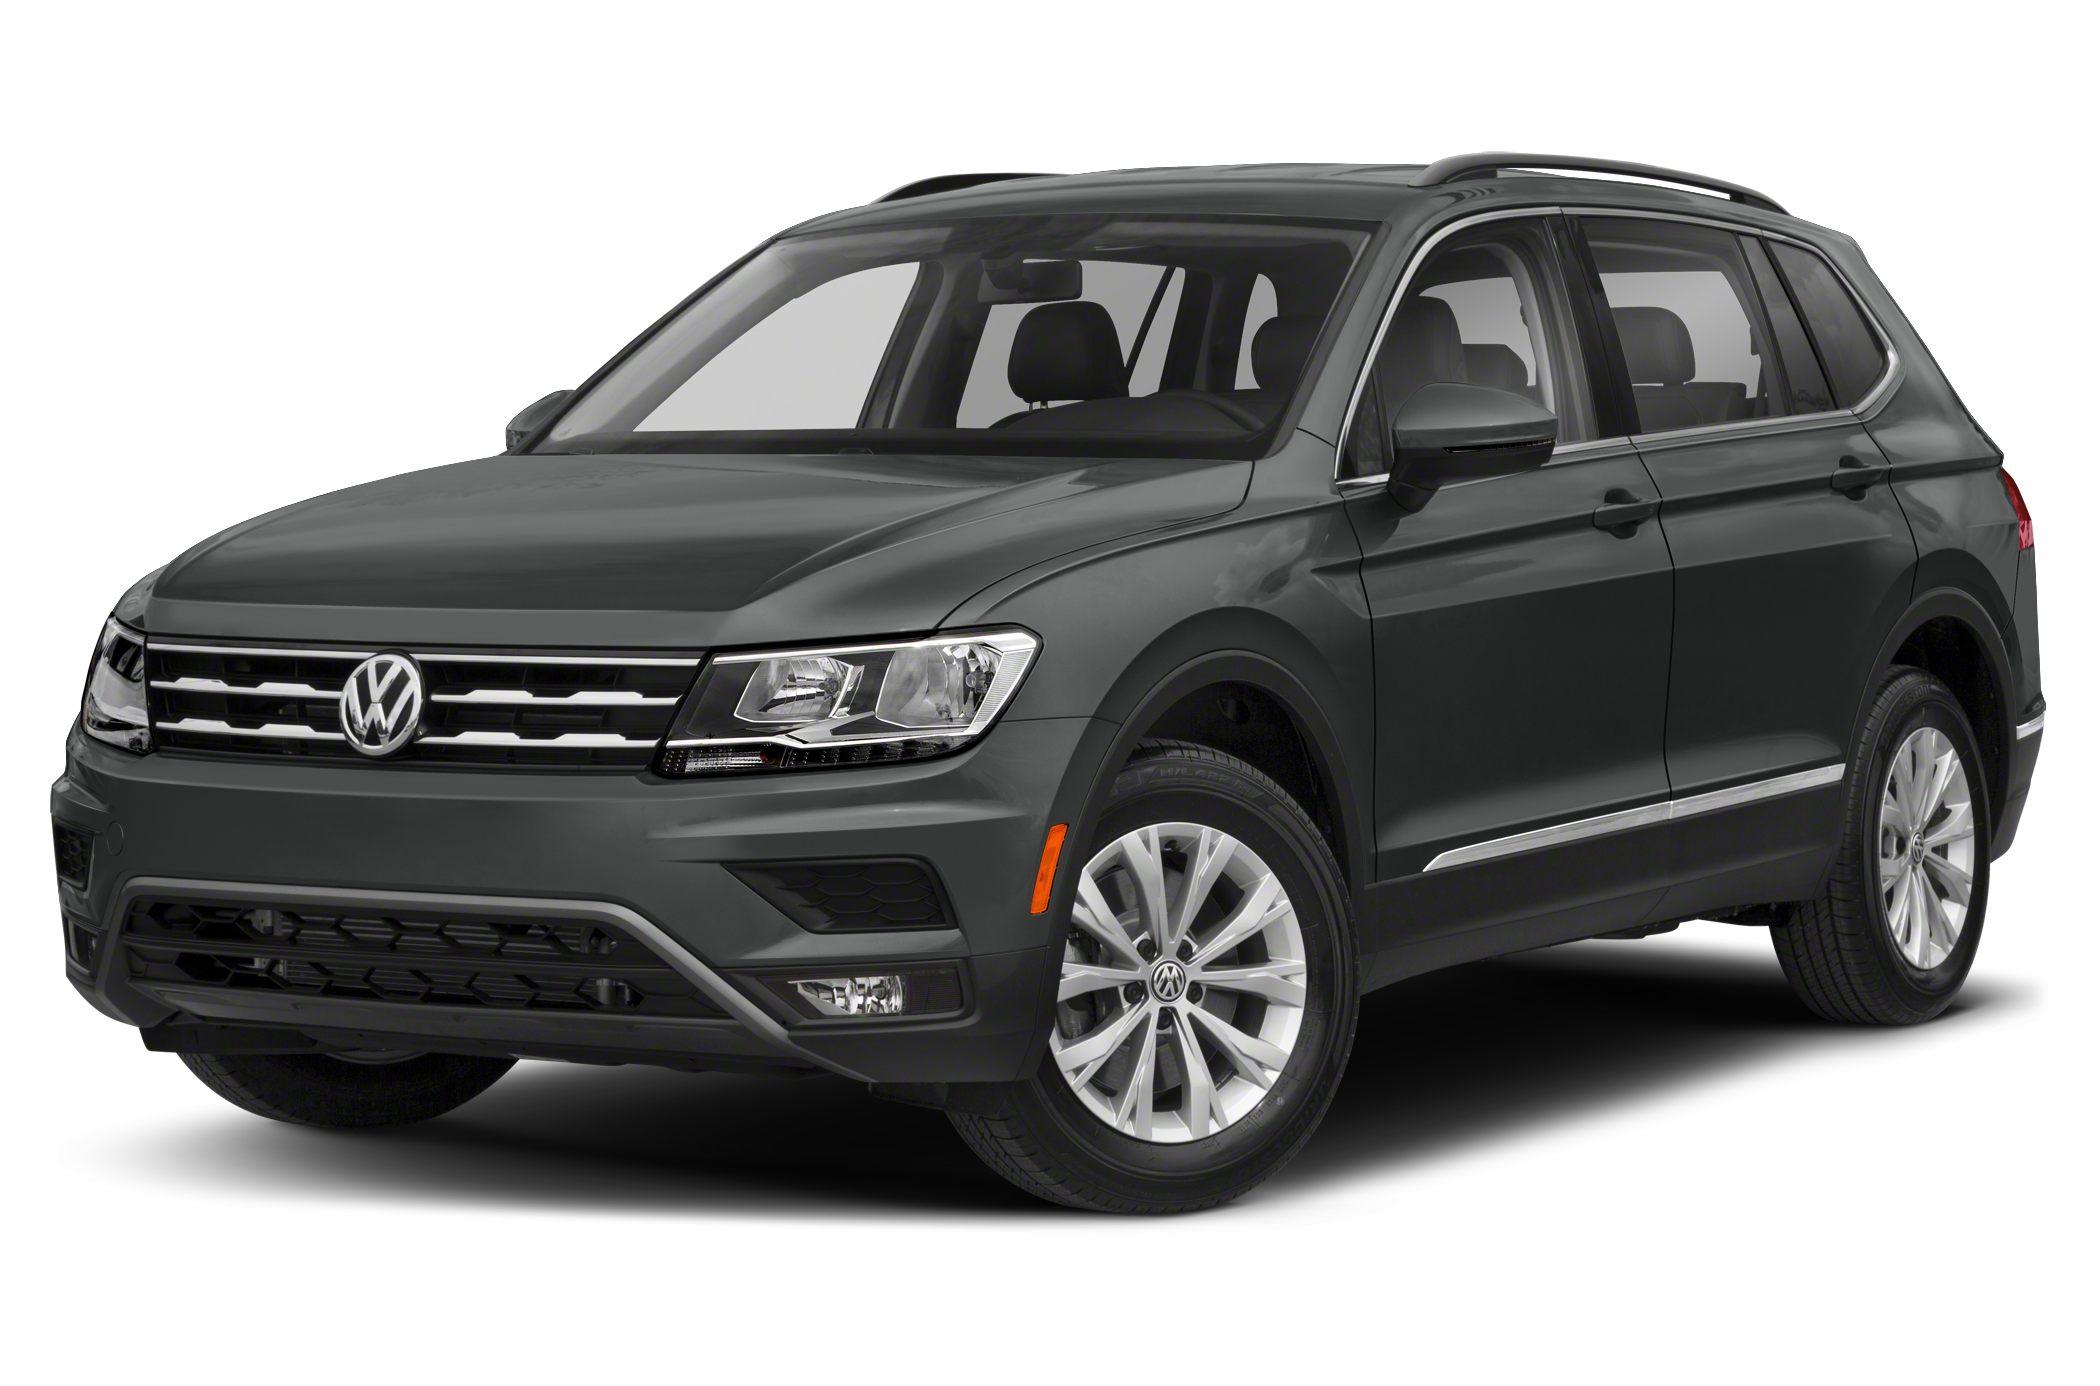 2019 Volkswagen Tiguan 2.0T S 4dr All-wheel Drive 4MOTION